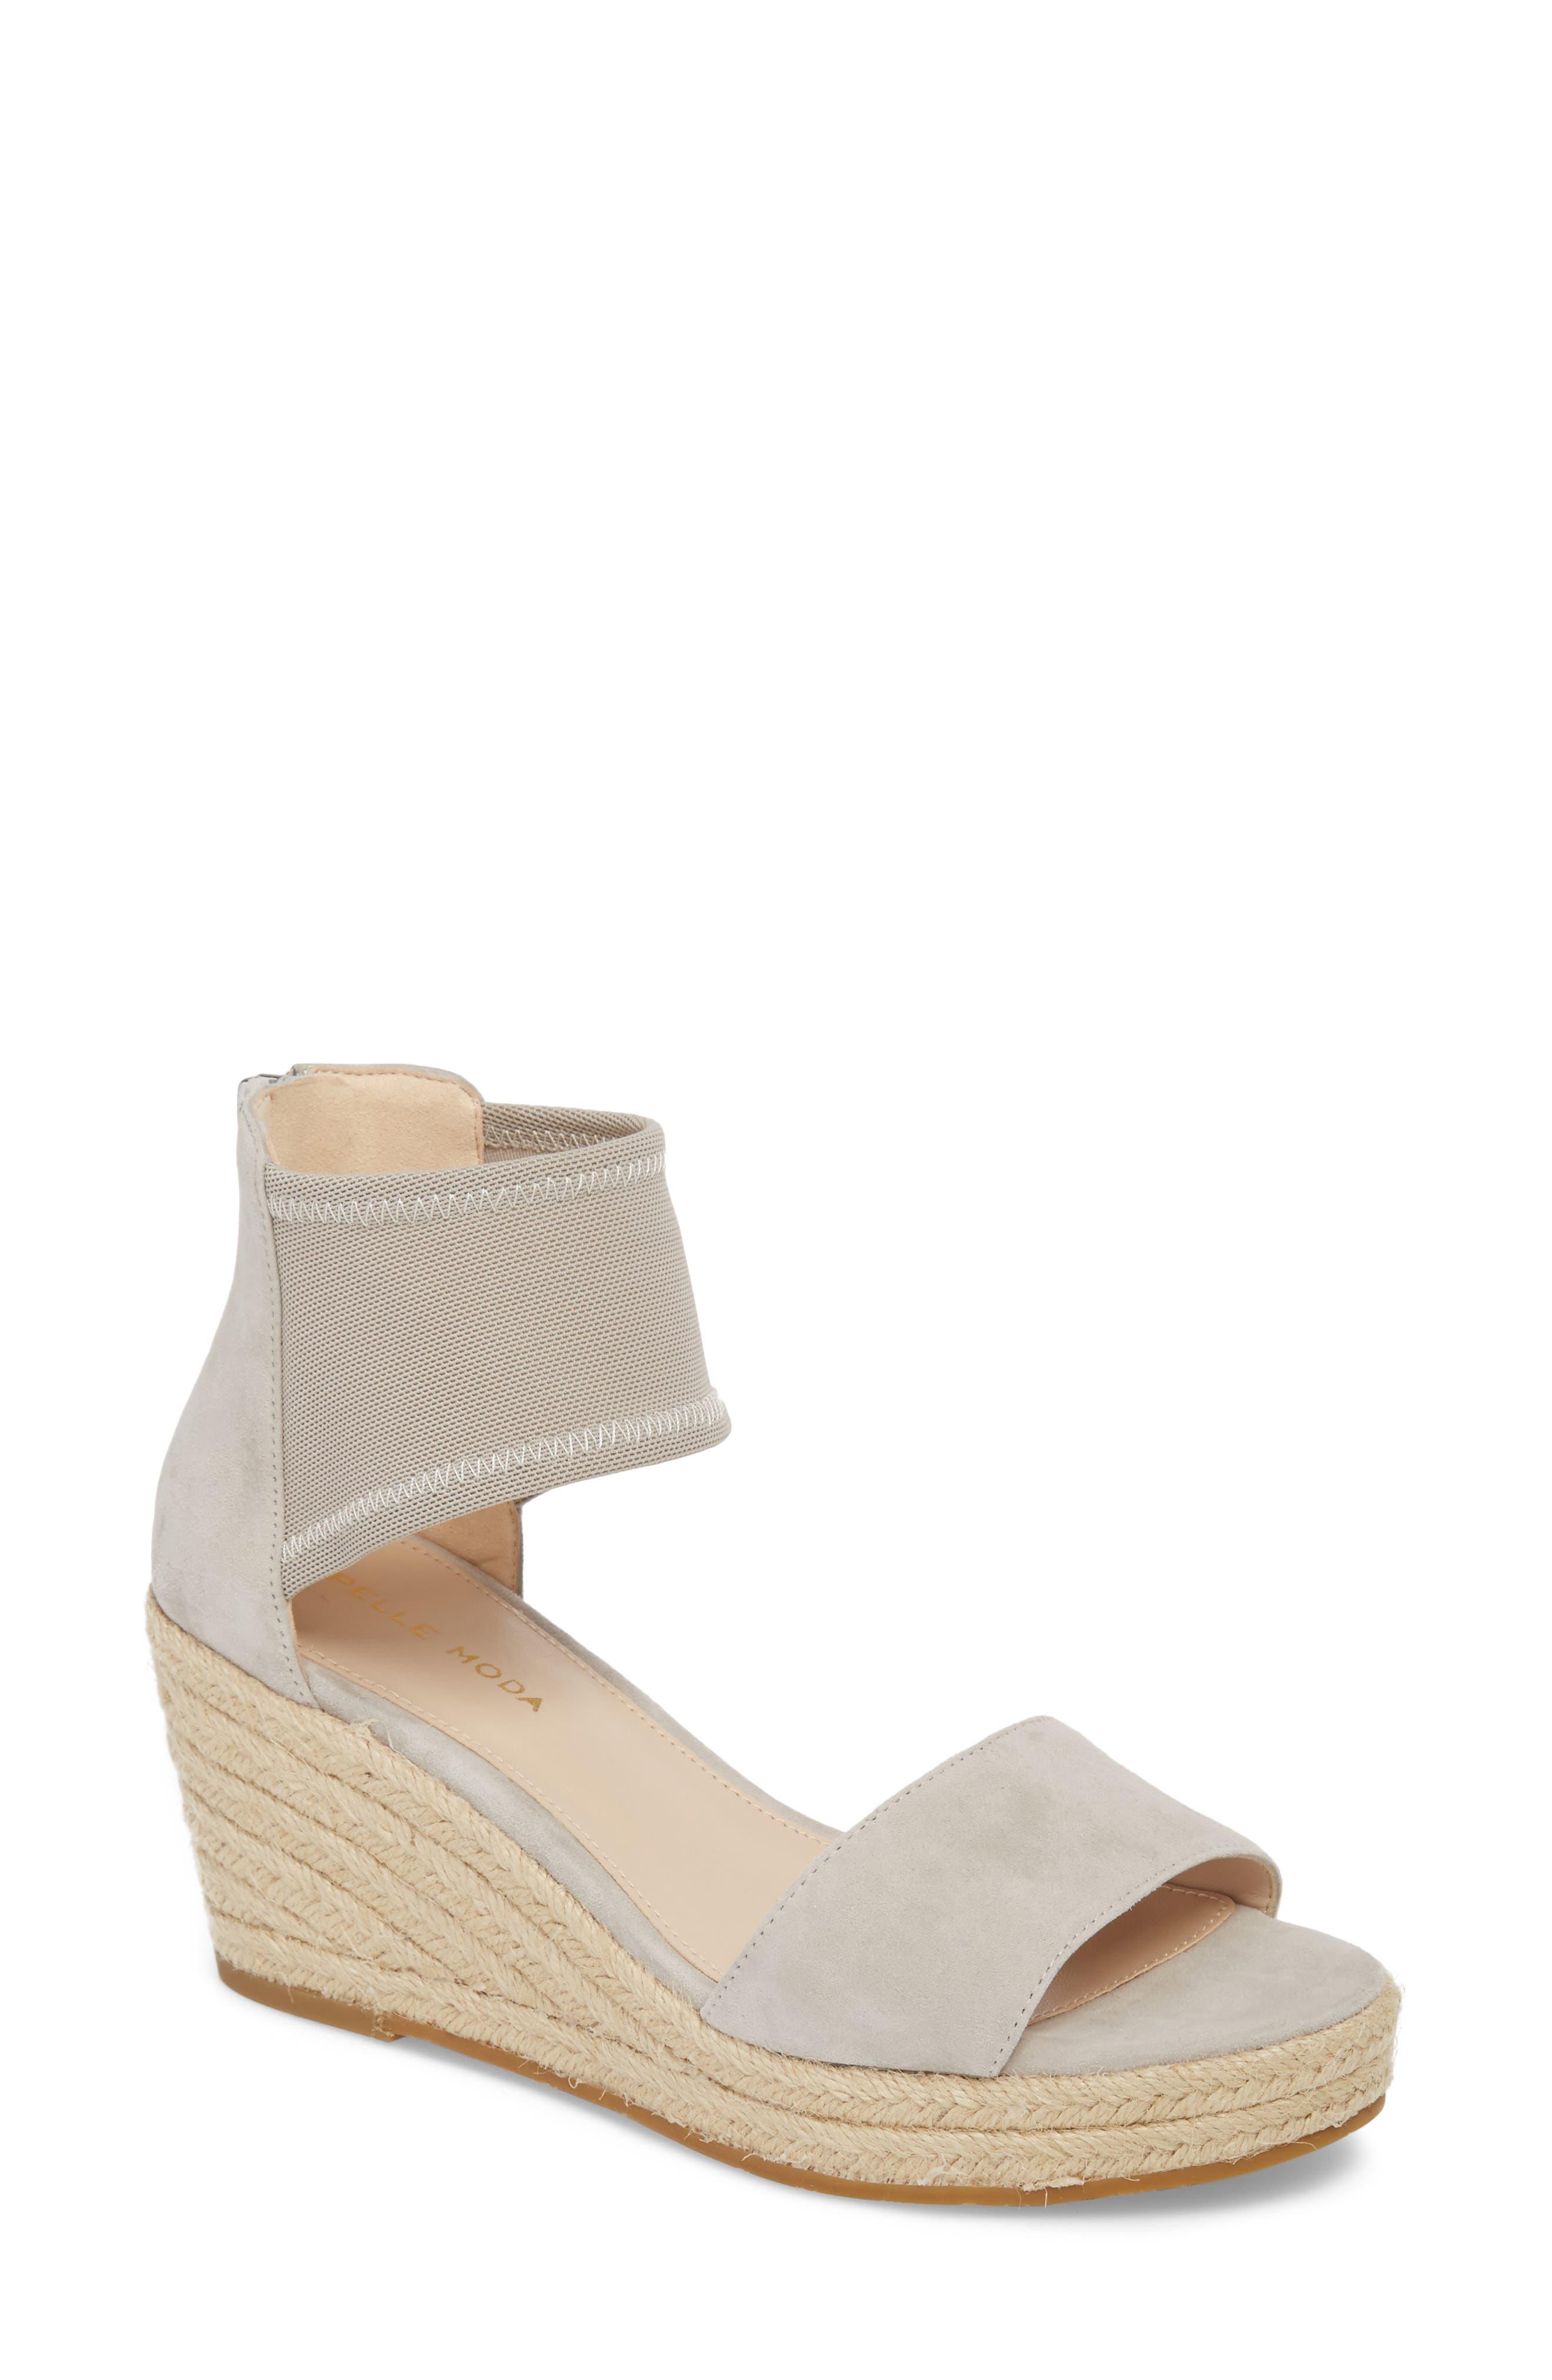 Main Image - Pelle Moda Kona Platform Wedge Sandal (Women)